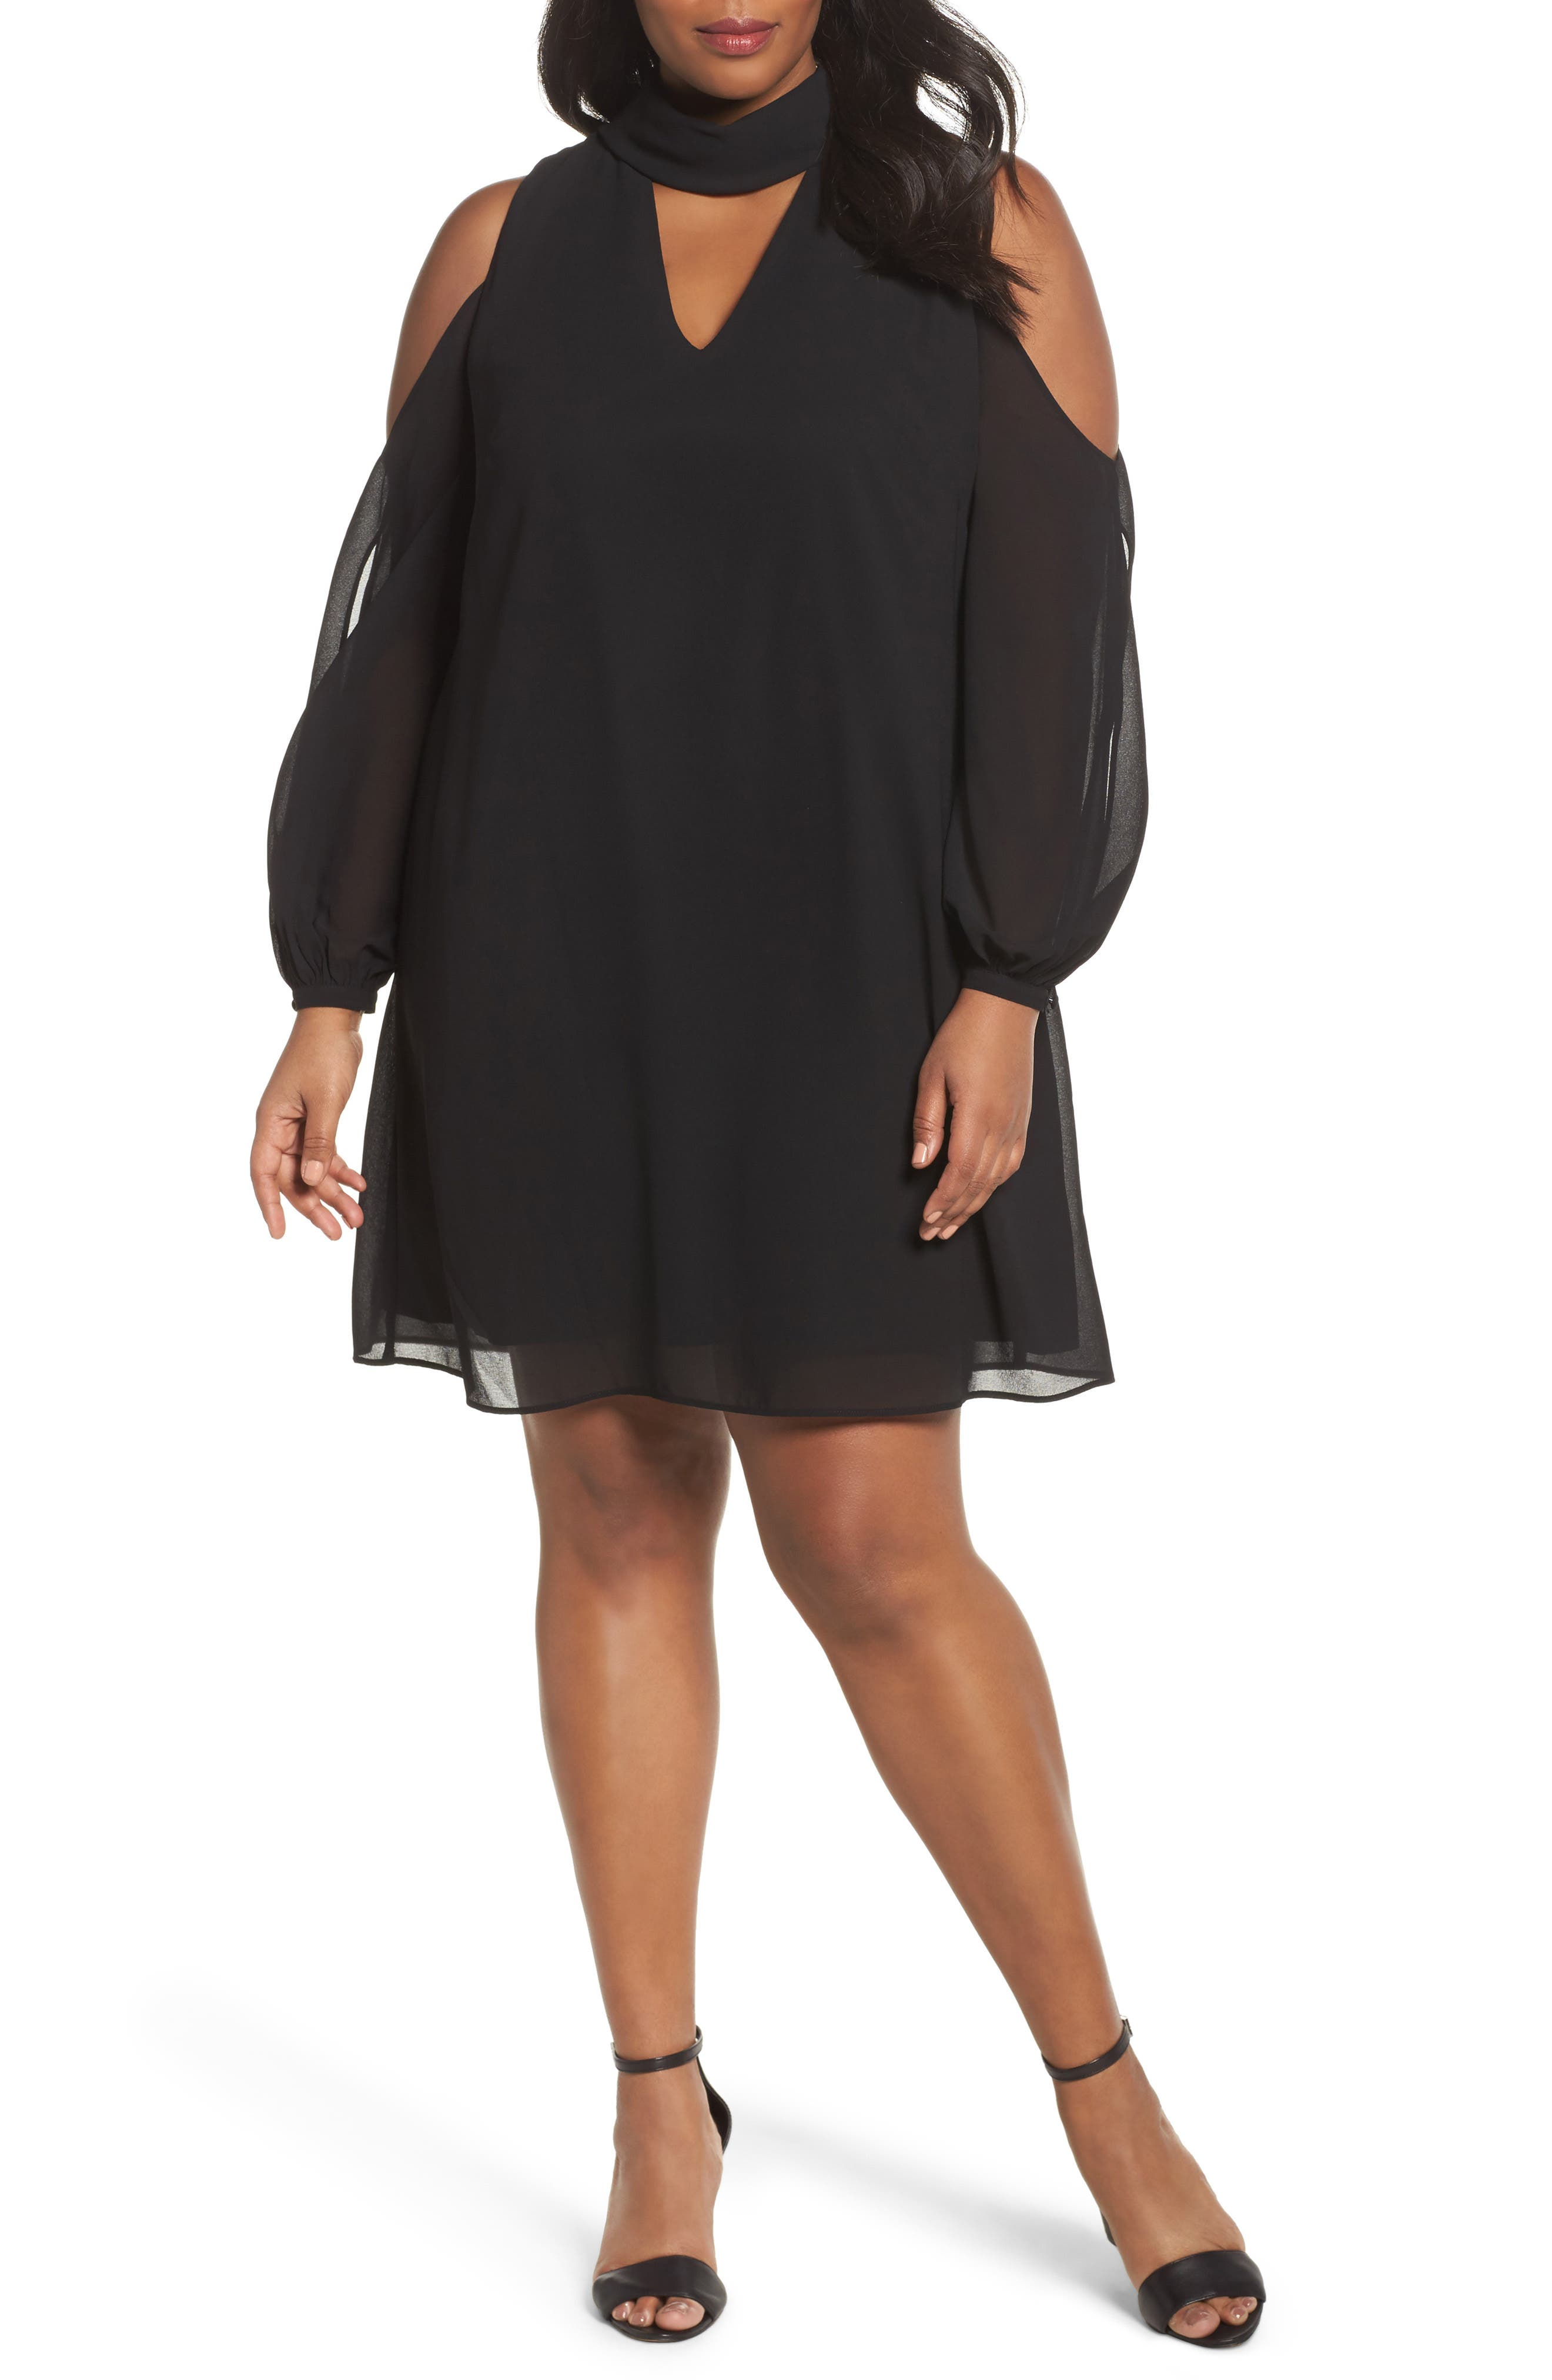 Choker Chiffon Dress,                         Main,                         color, Black